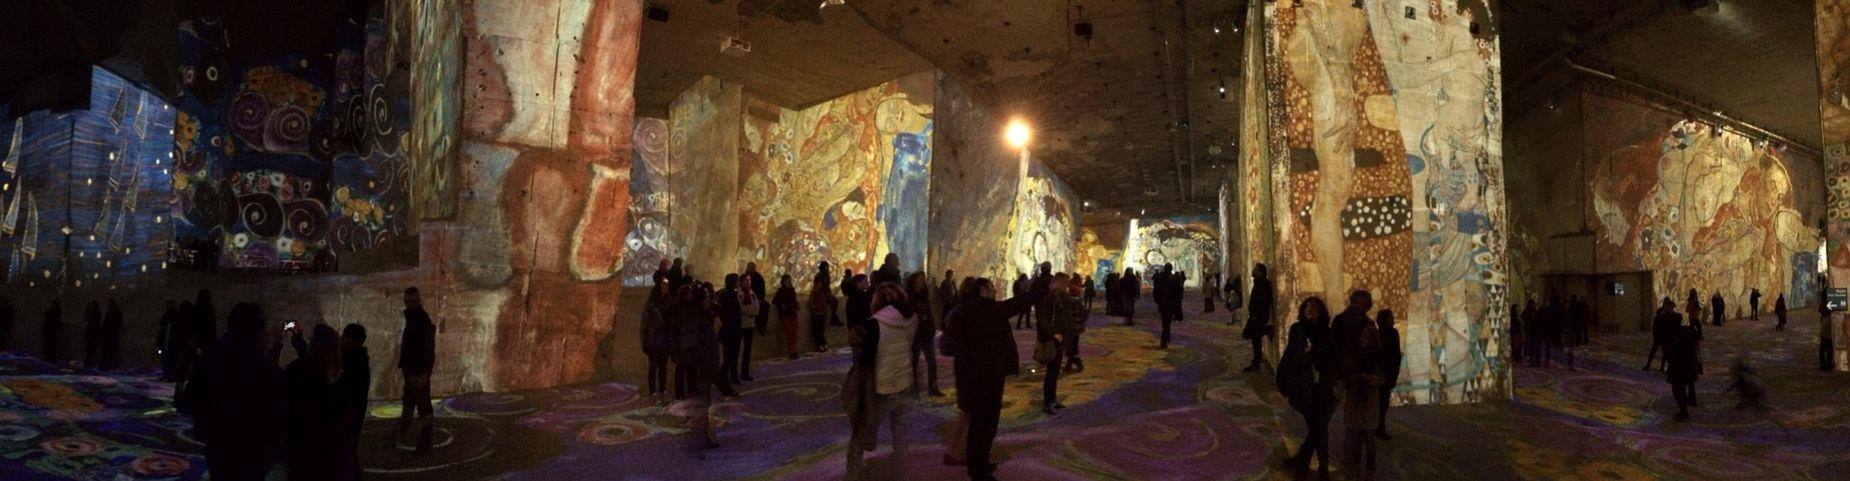 Enjoying Mapping at Les Baux De Provence from Klimt